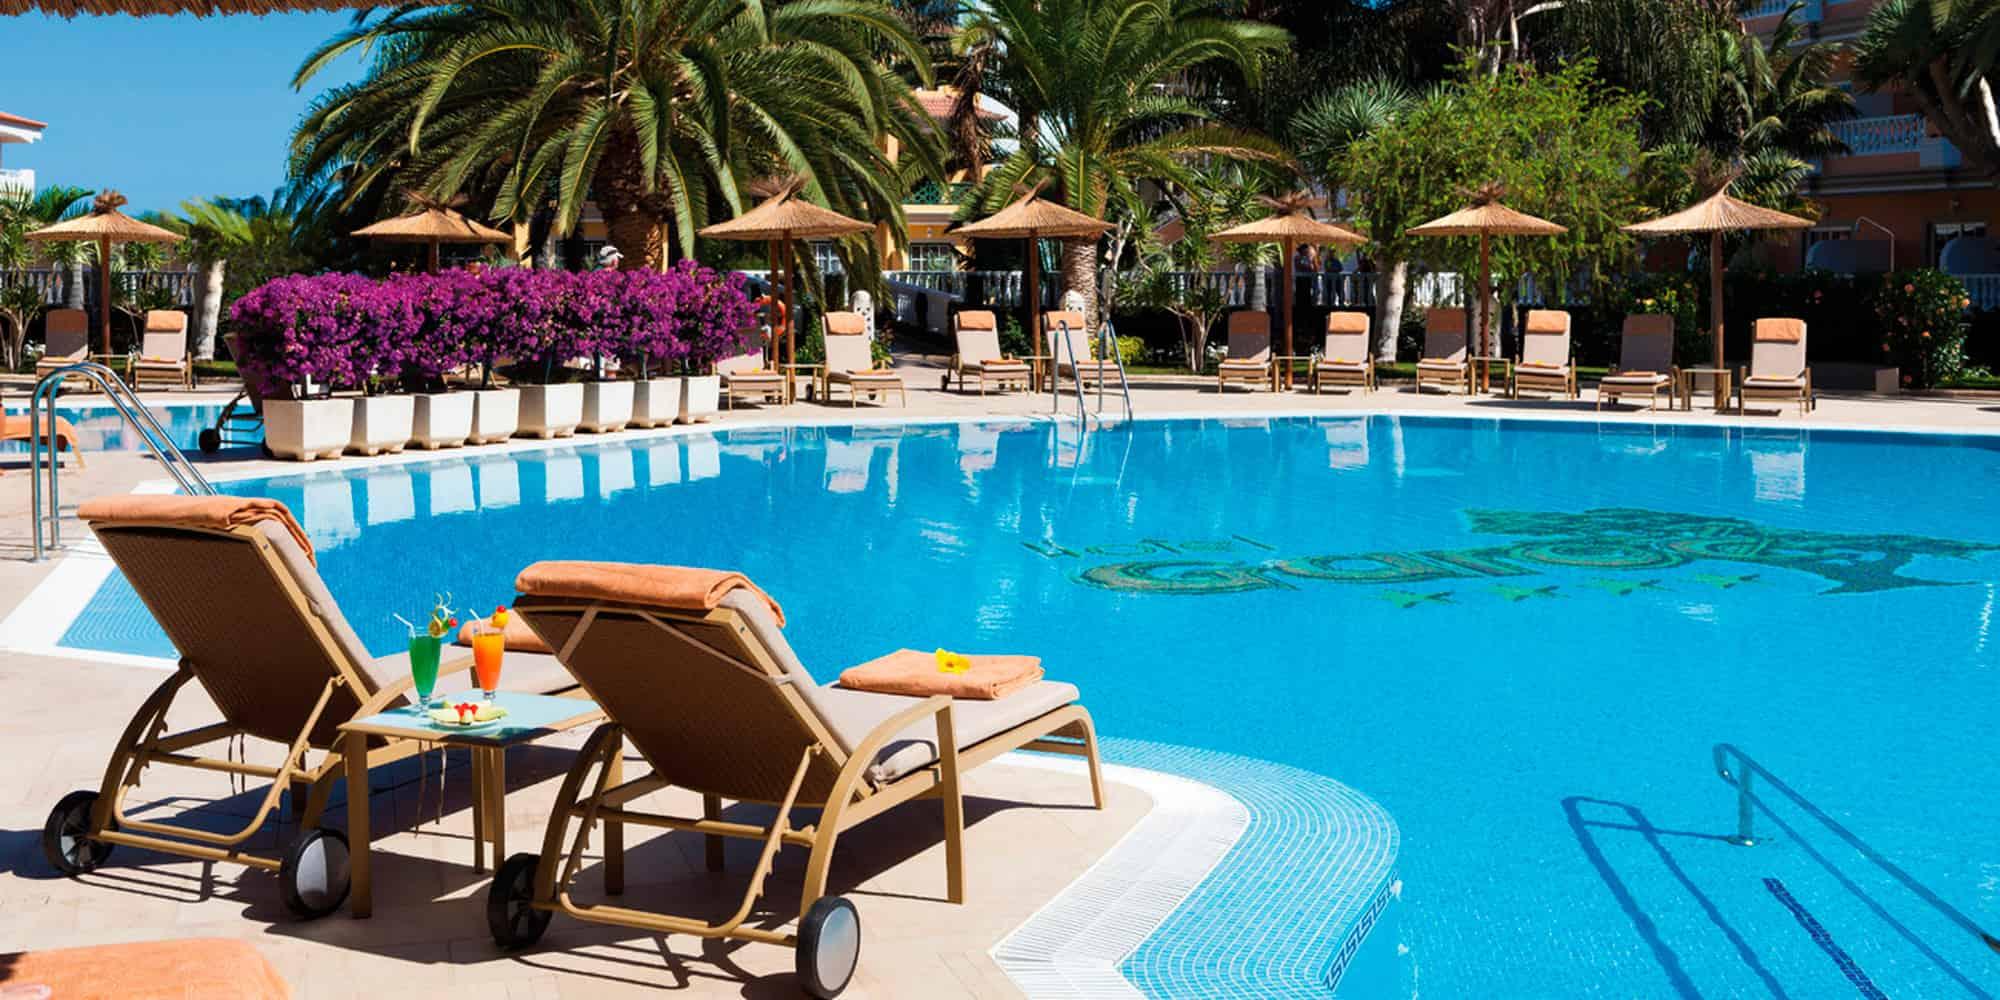 Hotel riu palace tres islas wellnesshotel strand van corralejo - Hotel Riu Palace Tres Islas Wellnesshotel Strand Van Corralejo 5